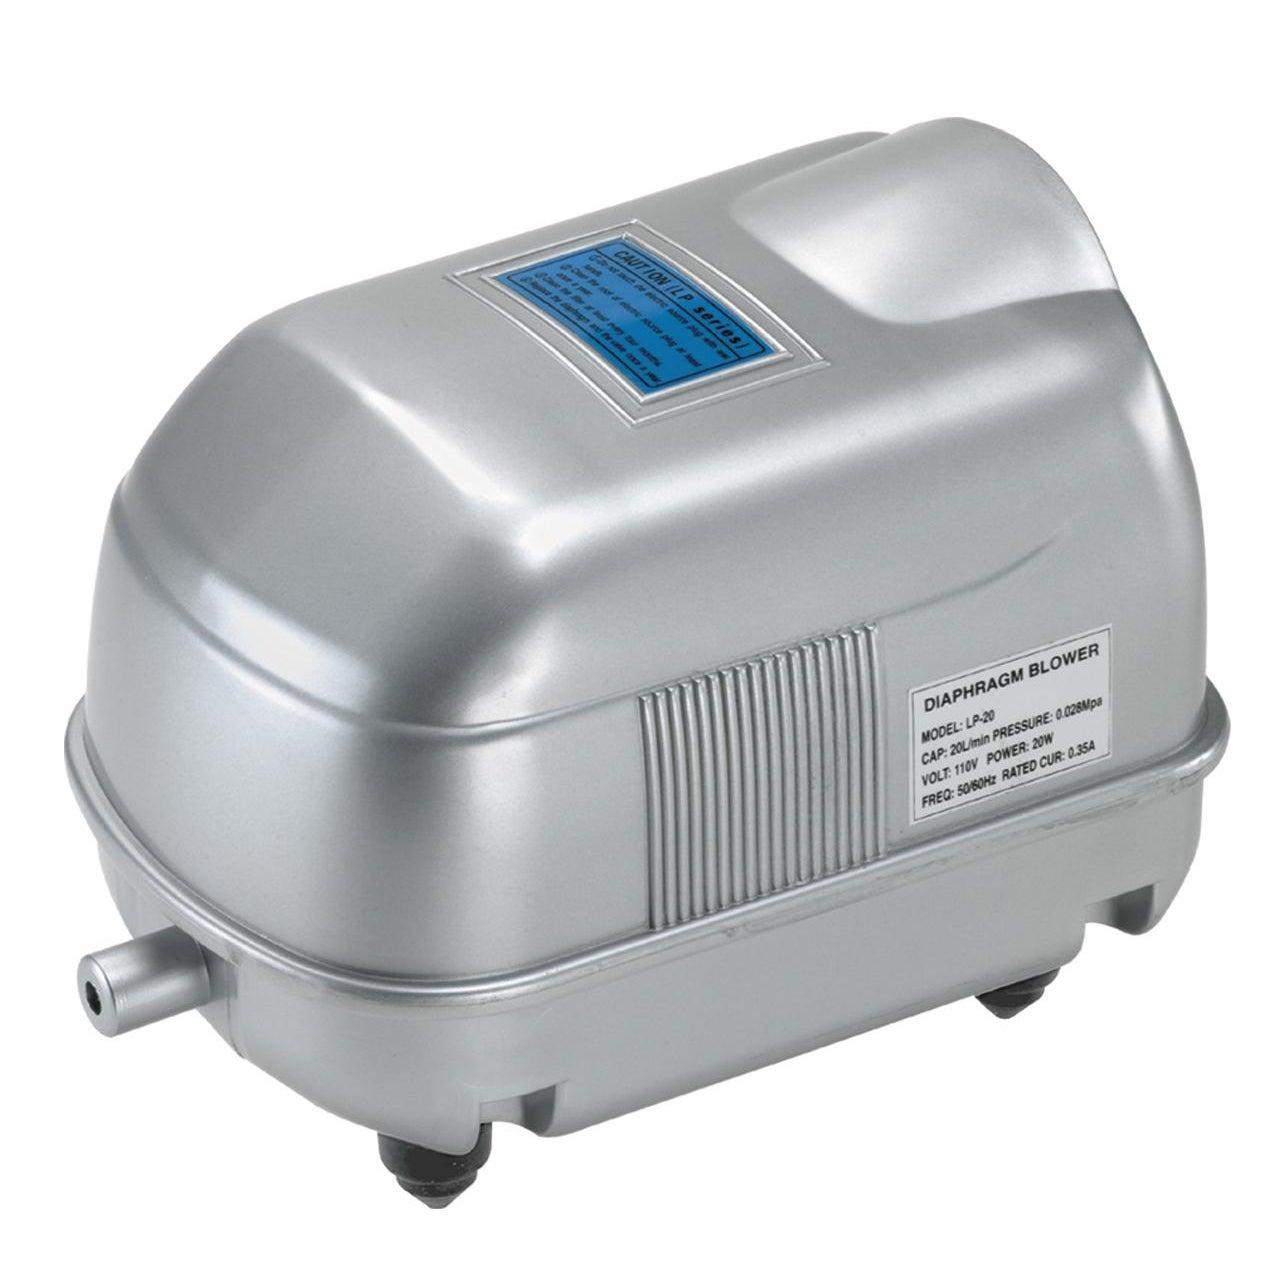 Danner 4520 1700-cubic-inch Air Pump with Diffuser (Danne...